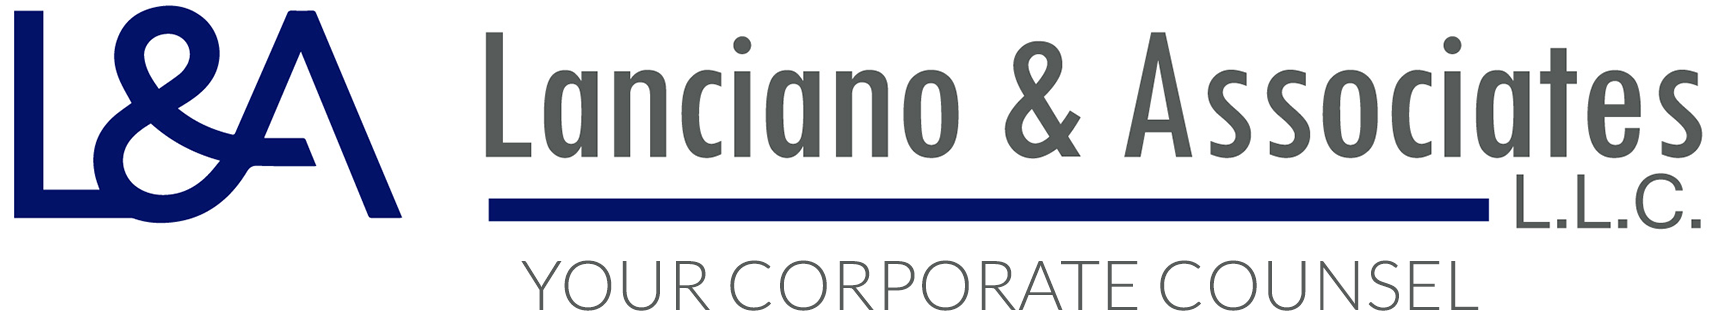 Lanciano & Associates, L.L.C.